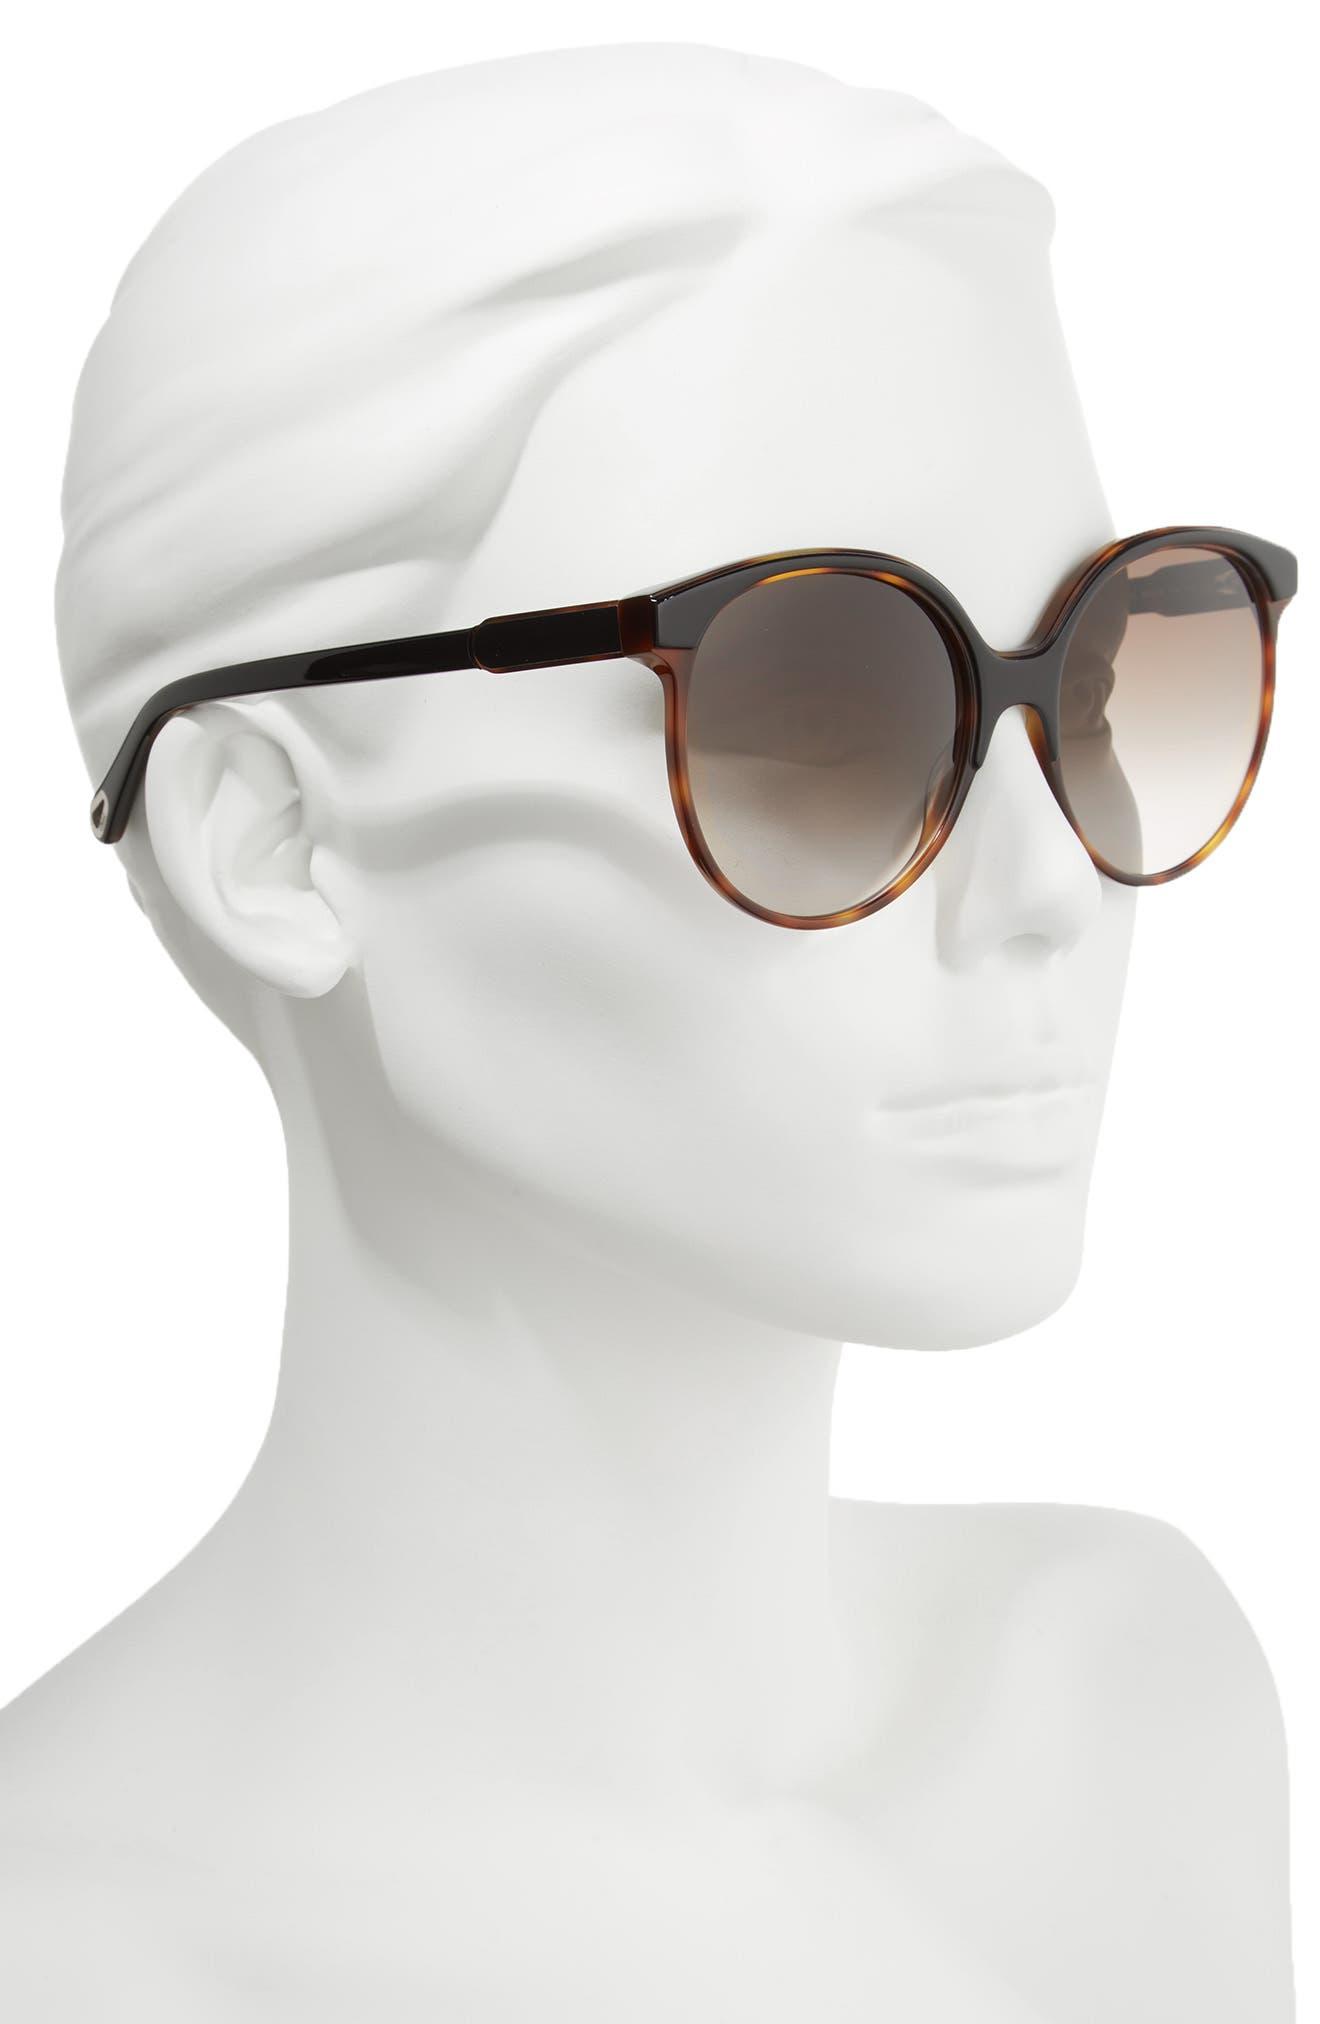 59mm Round Sunglasses,                             Alternate thumbnail 2, color,                             004